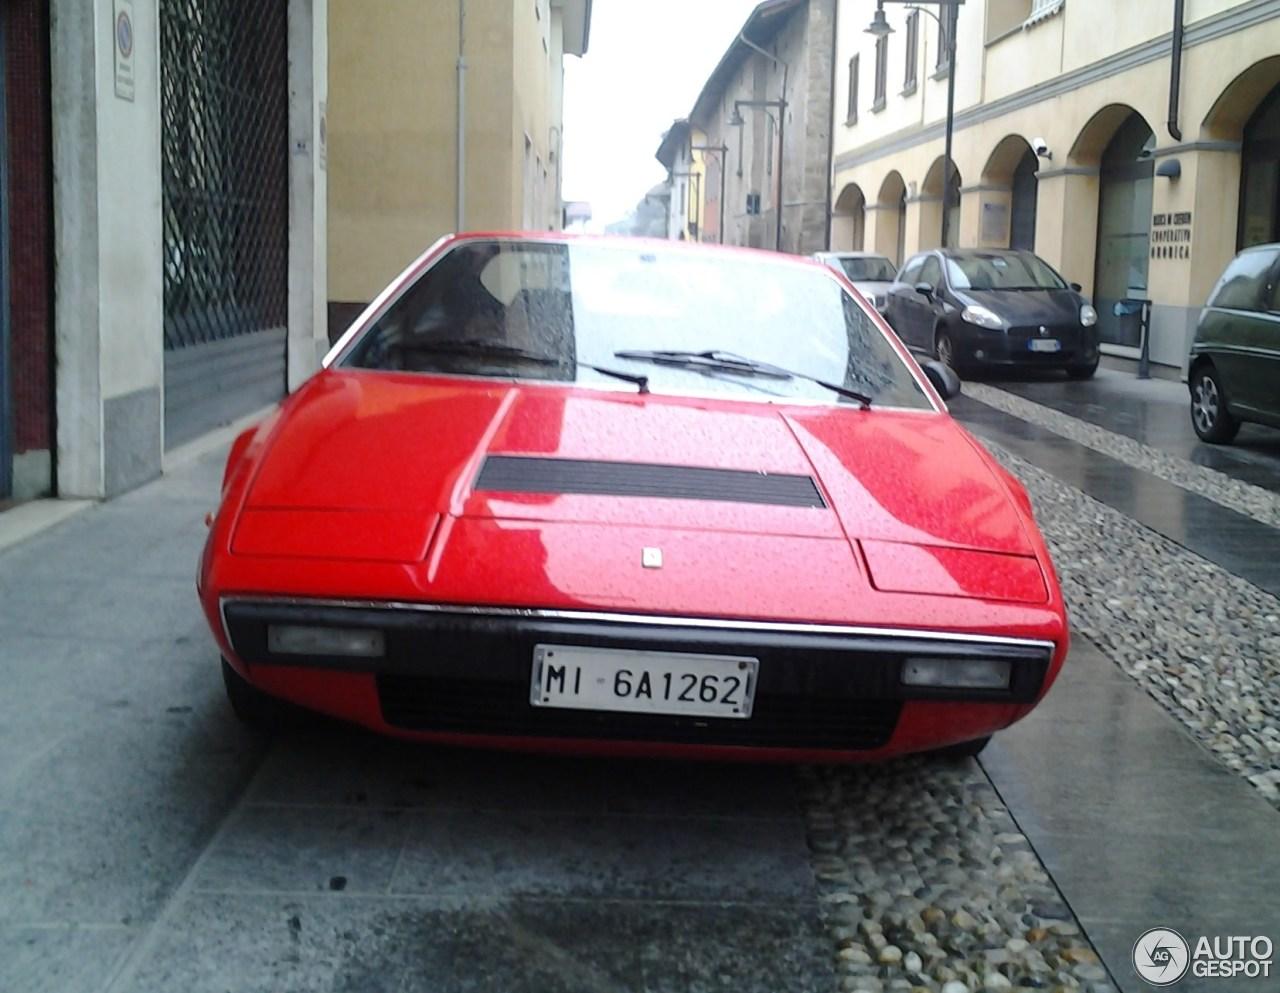 Ferrari 365 GT4 22 400 and 412  Wikipedia